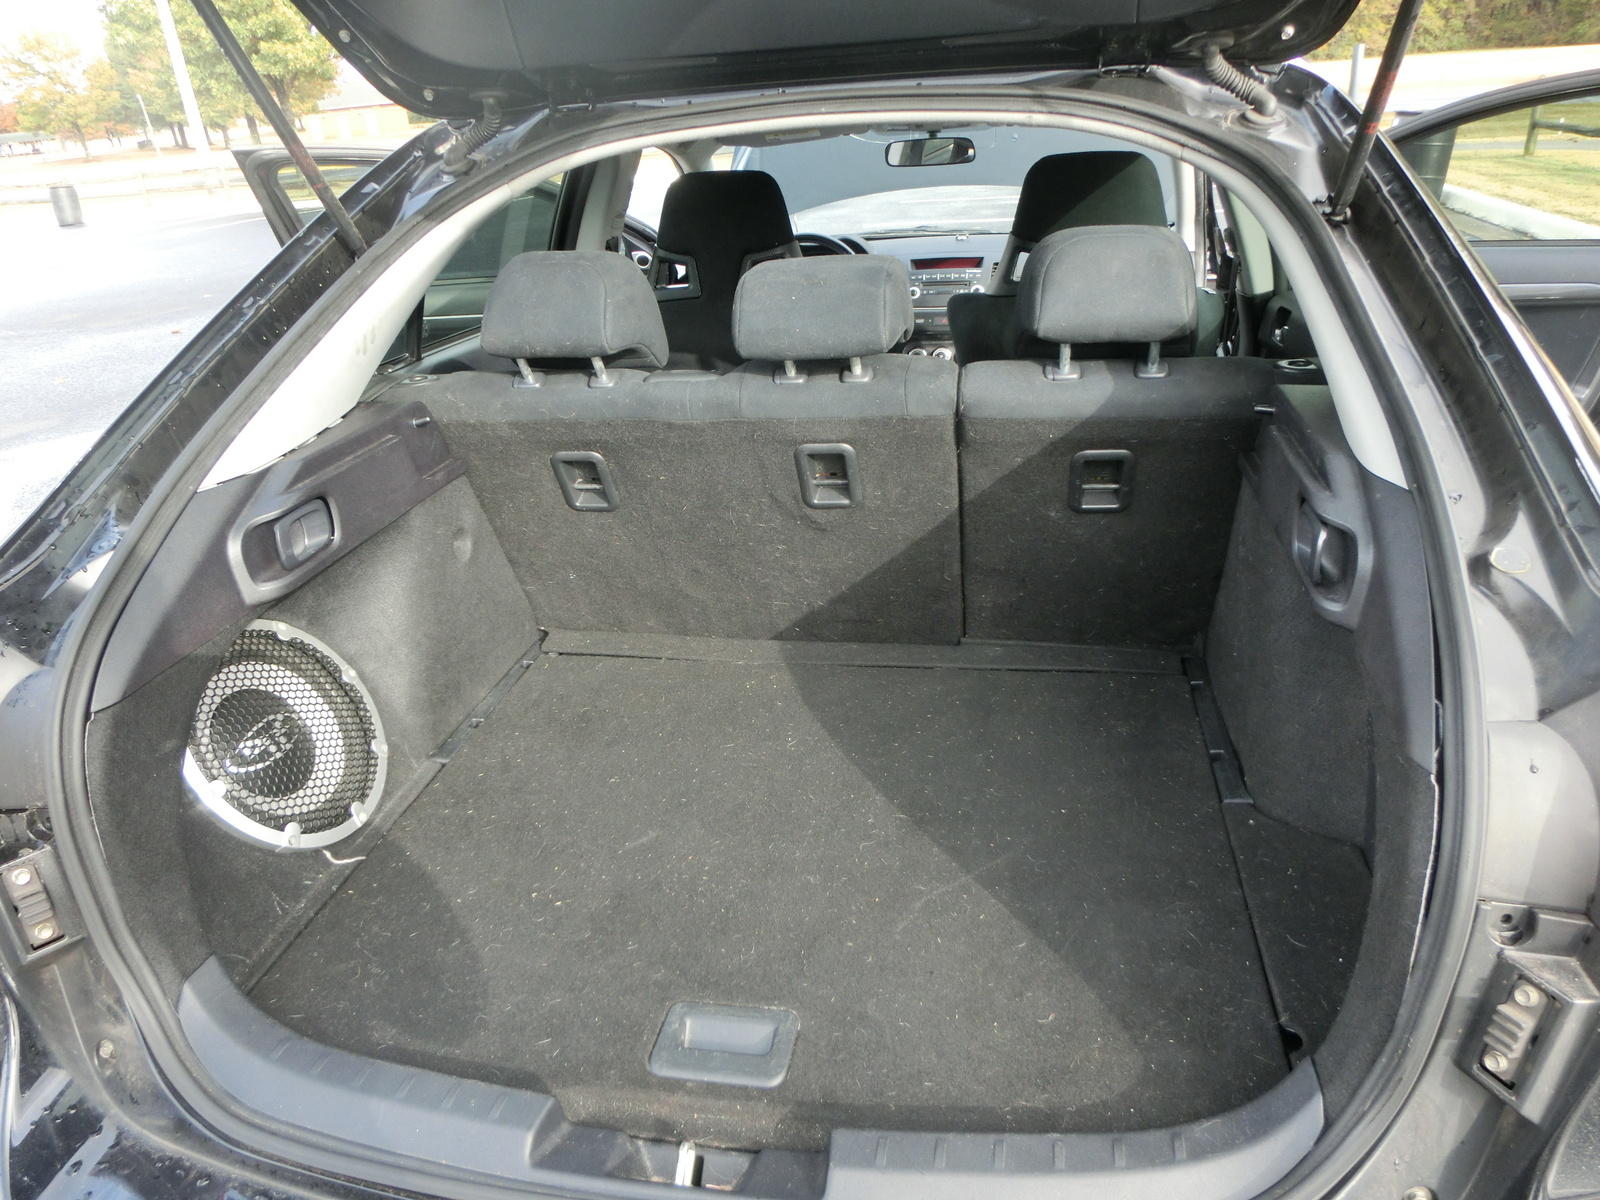 2010 Mitsubishi Lancer Sportback Pictures Cargurus